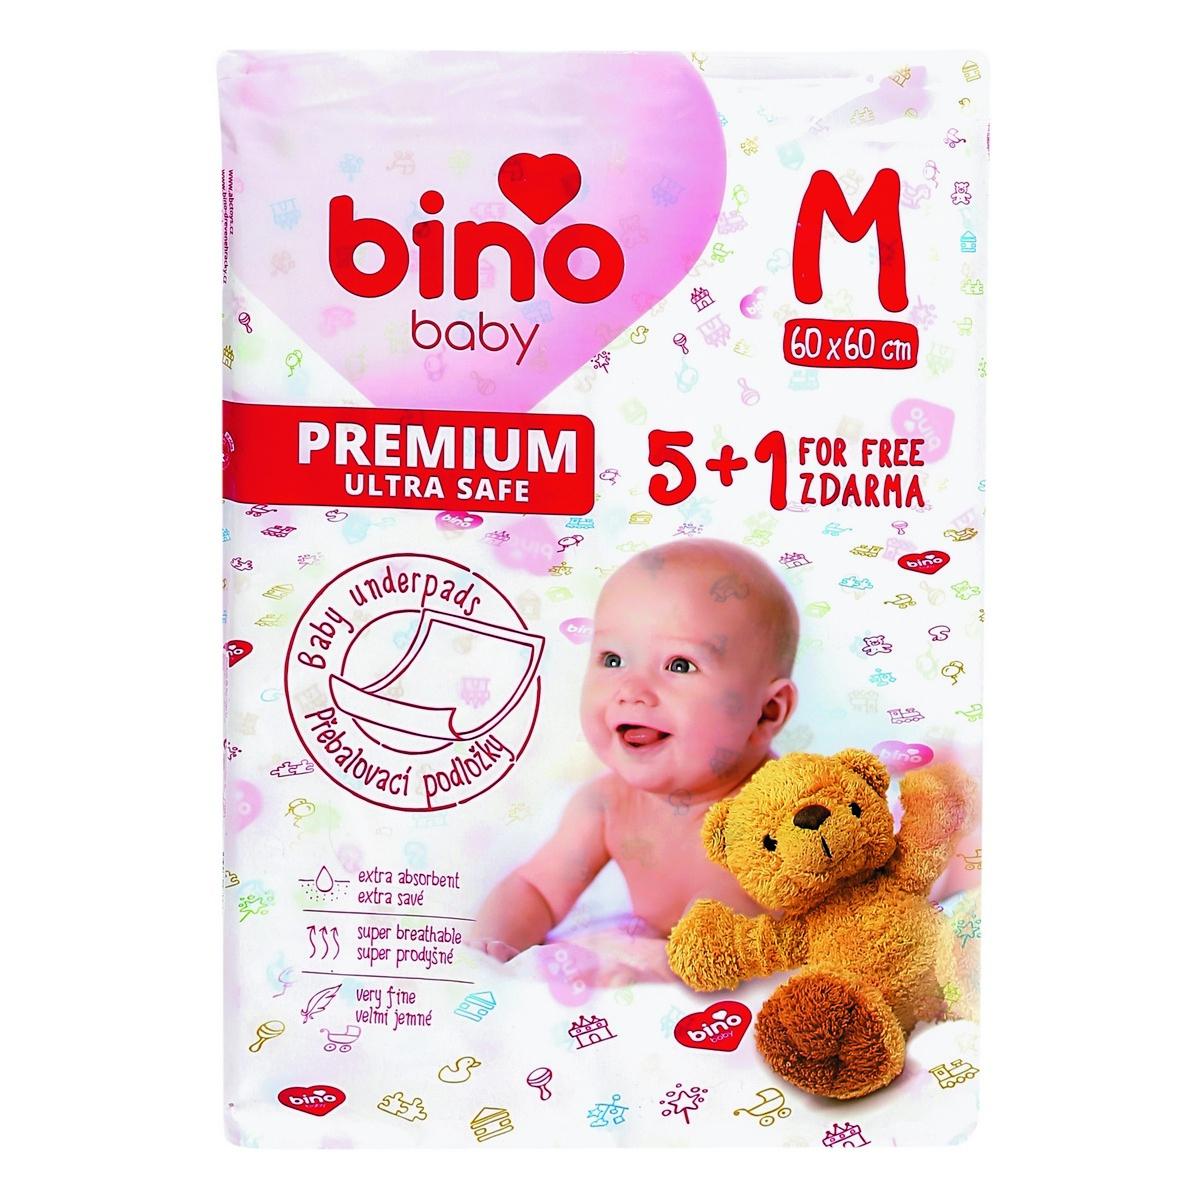 Bino Baby Přebalovací podložka Premium M 6 ks, 60 x 60 cm